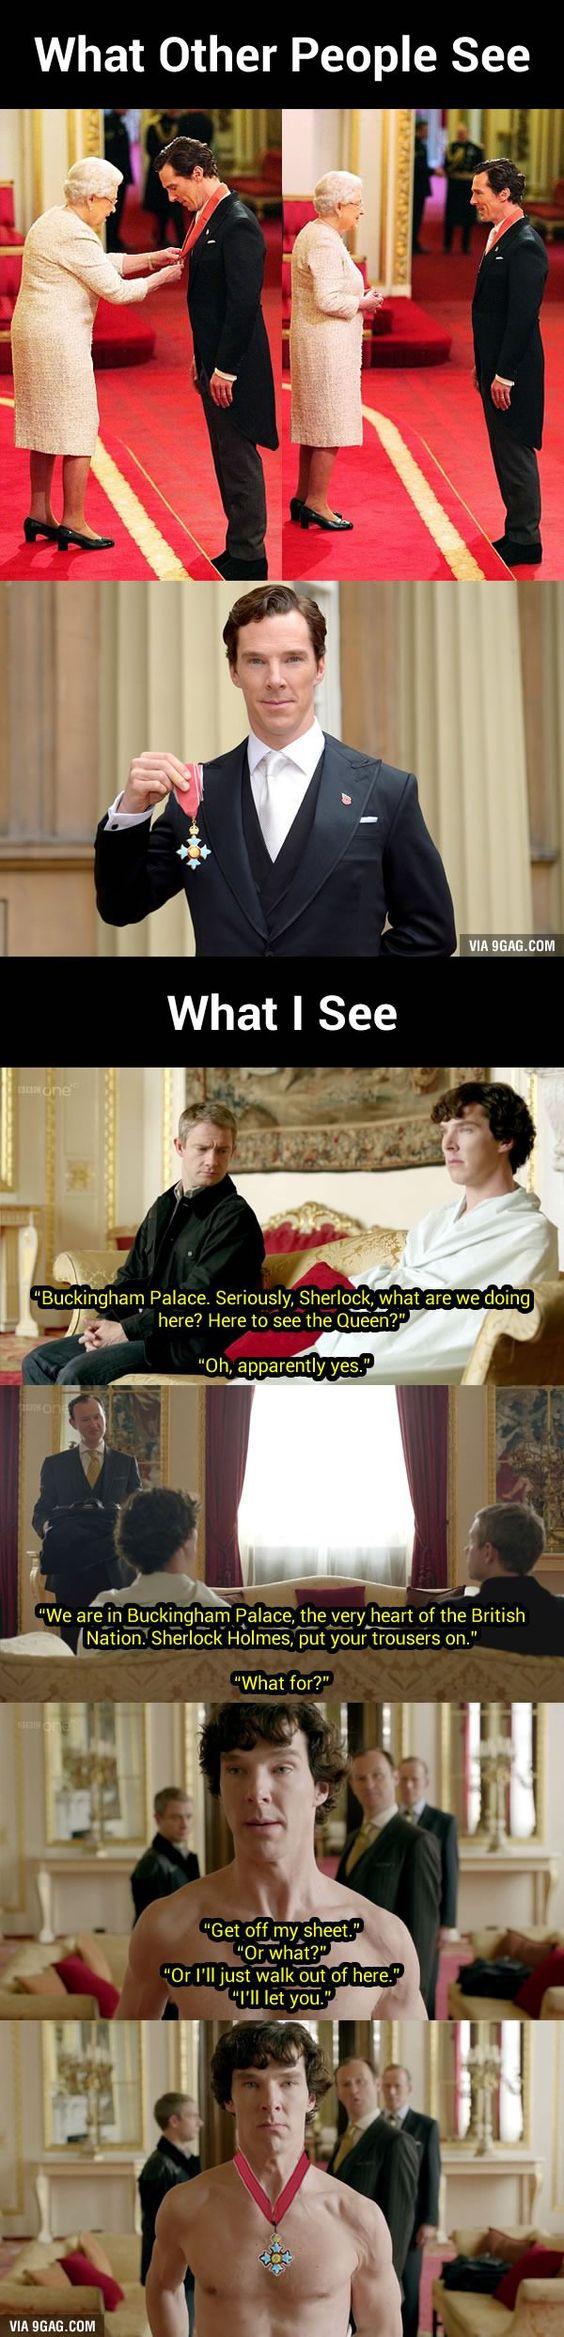 Sherlock Meets The Queen: Benedict Cumberbatch Receiving CBE Looks Oddly Familiar…